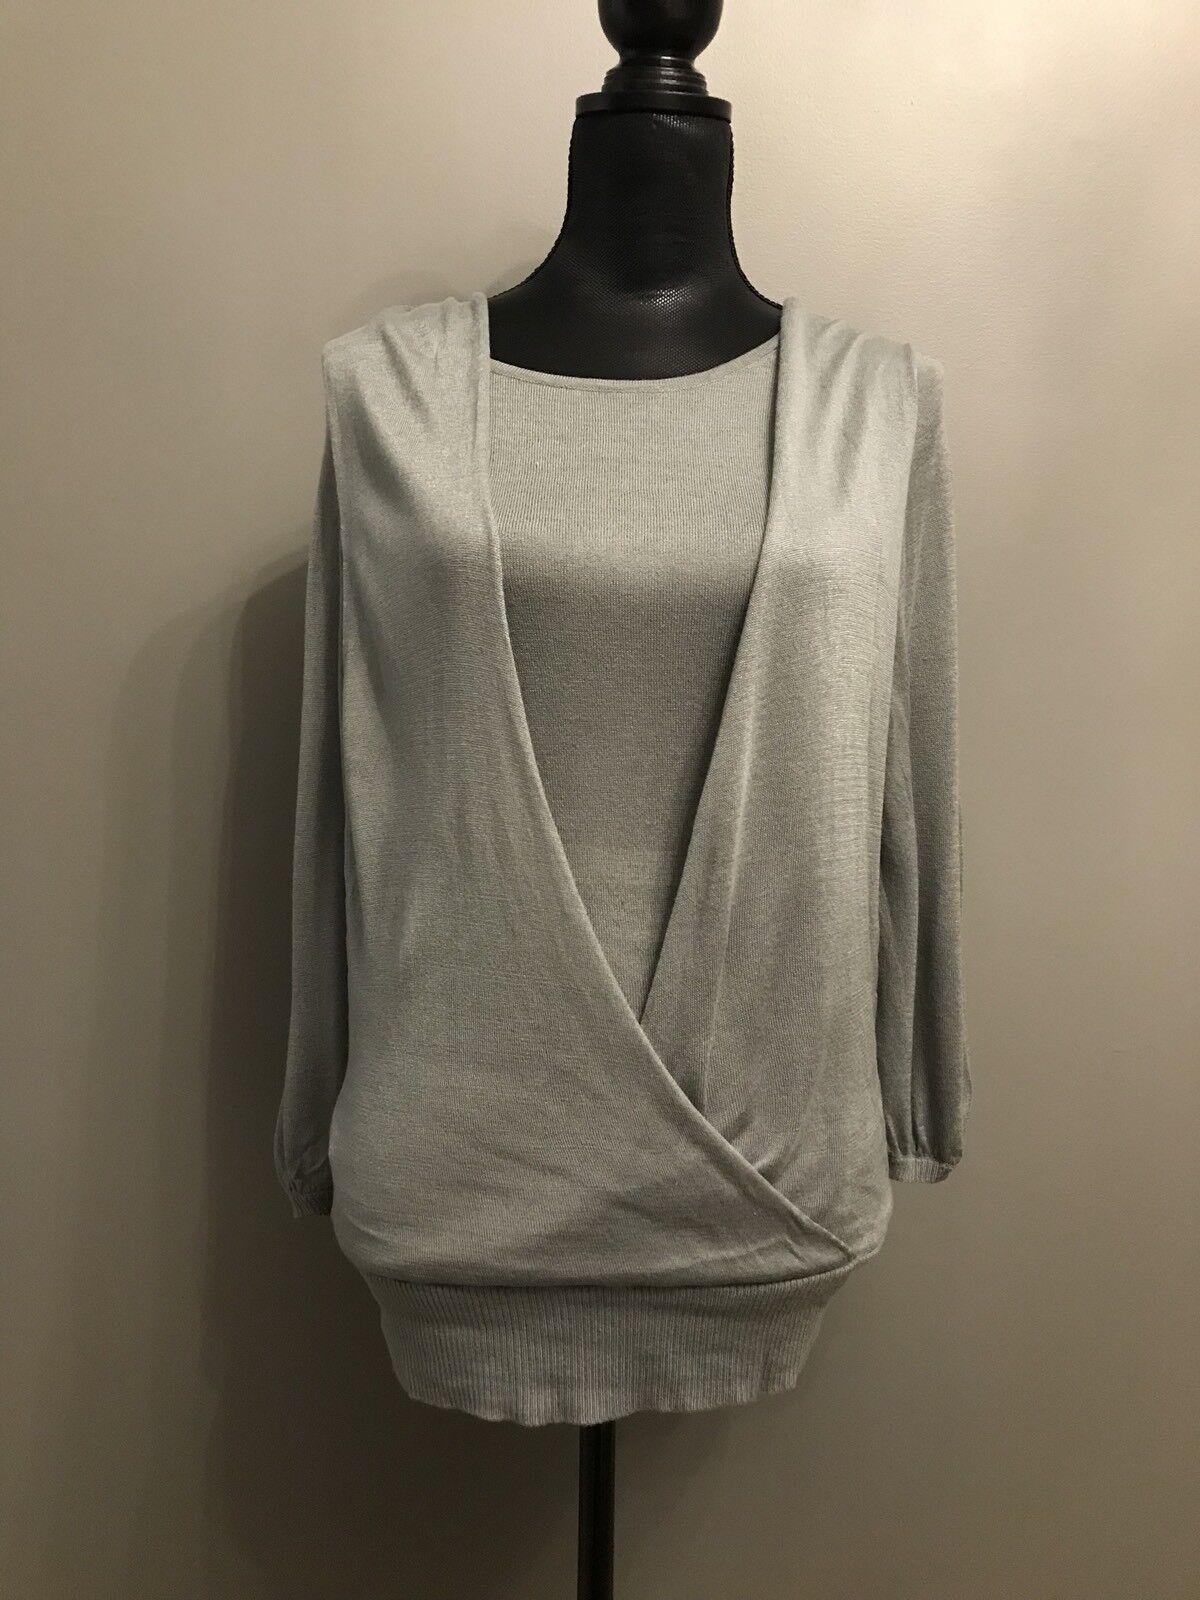 BCBG Maxazria Light Teal Drape Knit Silk-Blend Top Blouse Small